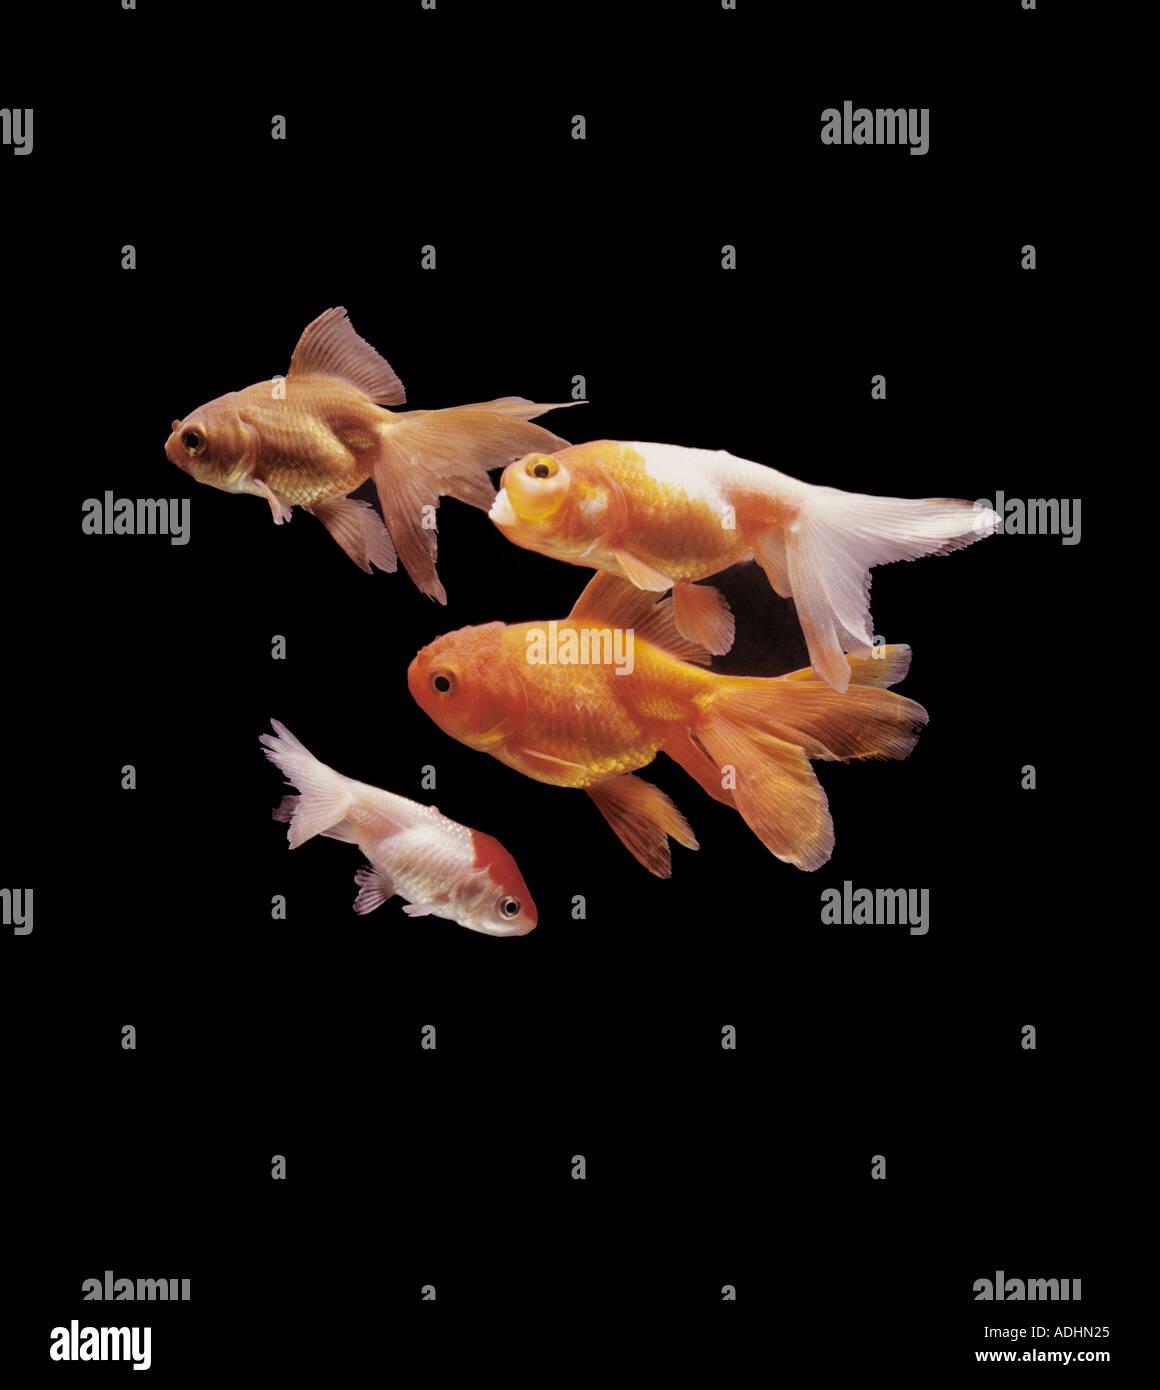 Variety of fancy goldfish orandas and water bubbli Carassius